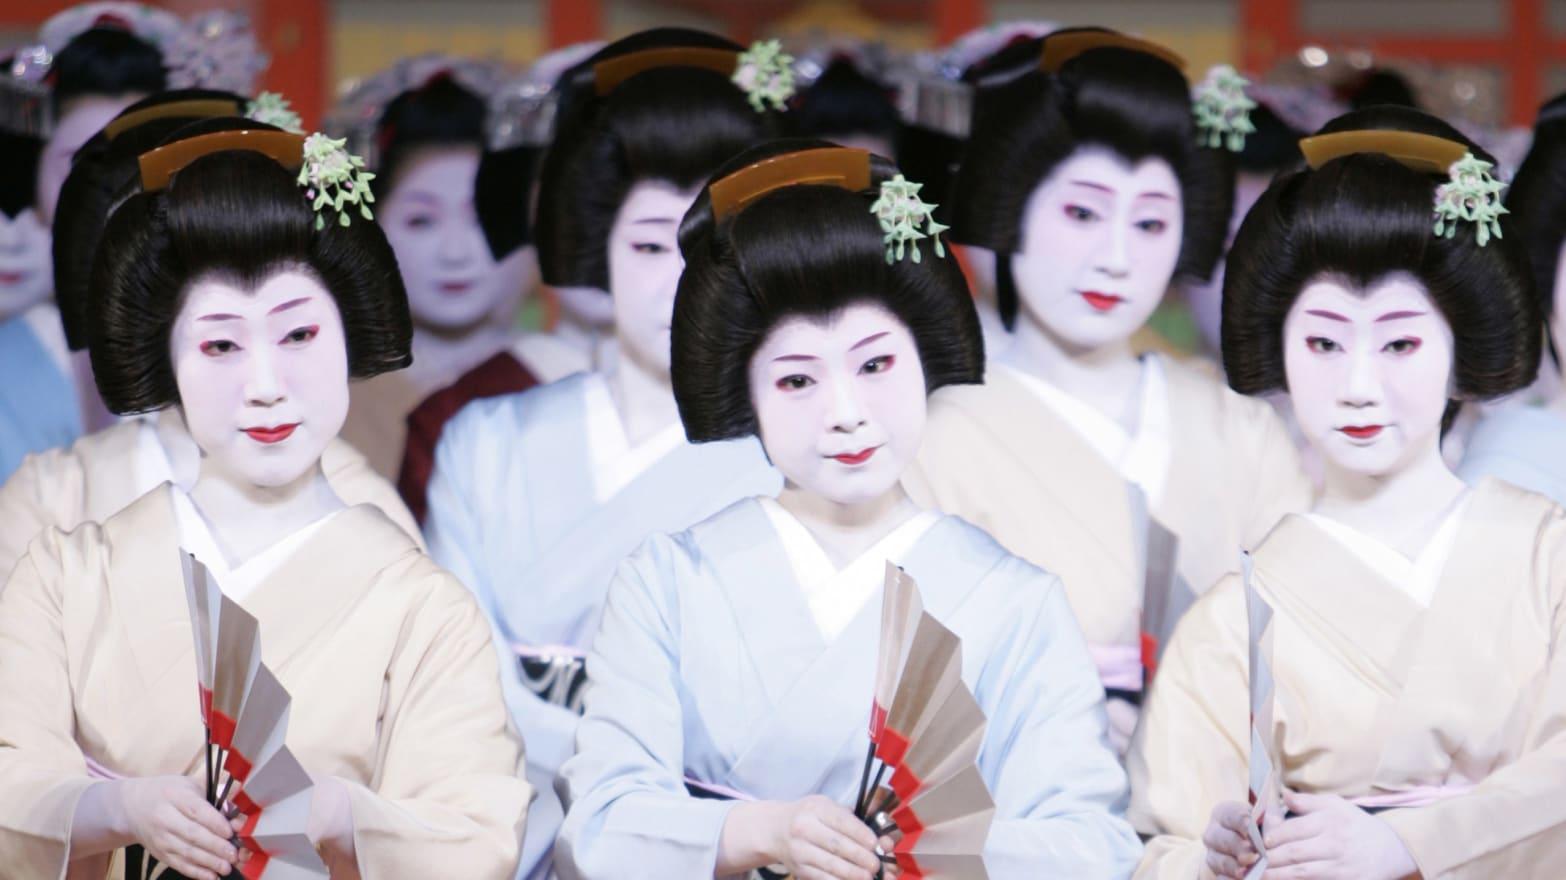 https://img.thedailybeast.com/image/upload/c_crop,d_placeholder_euli9k,h_1439,w_2560,x_0,y_0/dpr_1.5/c_limit,w_1044/fl_lossy,q_auto/v1492195722/articles/2014/09/01/bar-hopping-with-the-kyoto-geisha/140831-foreman-geisha-tease_fjmf9z